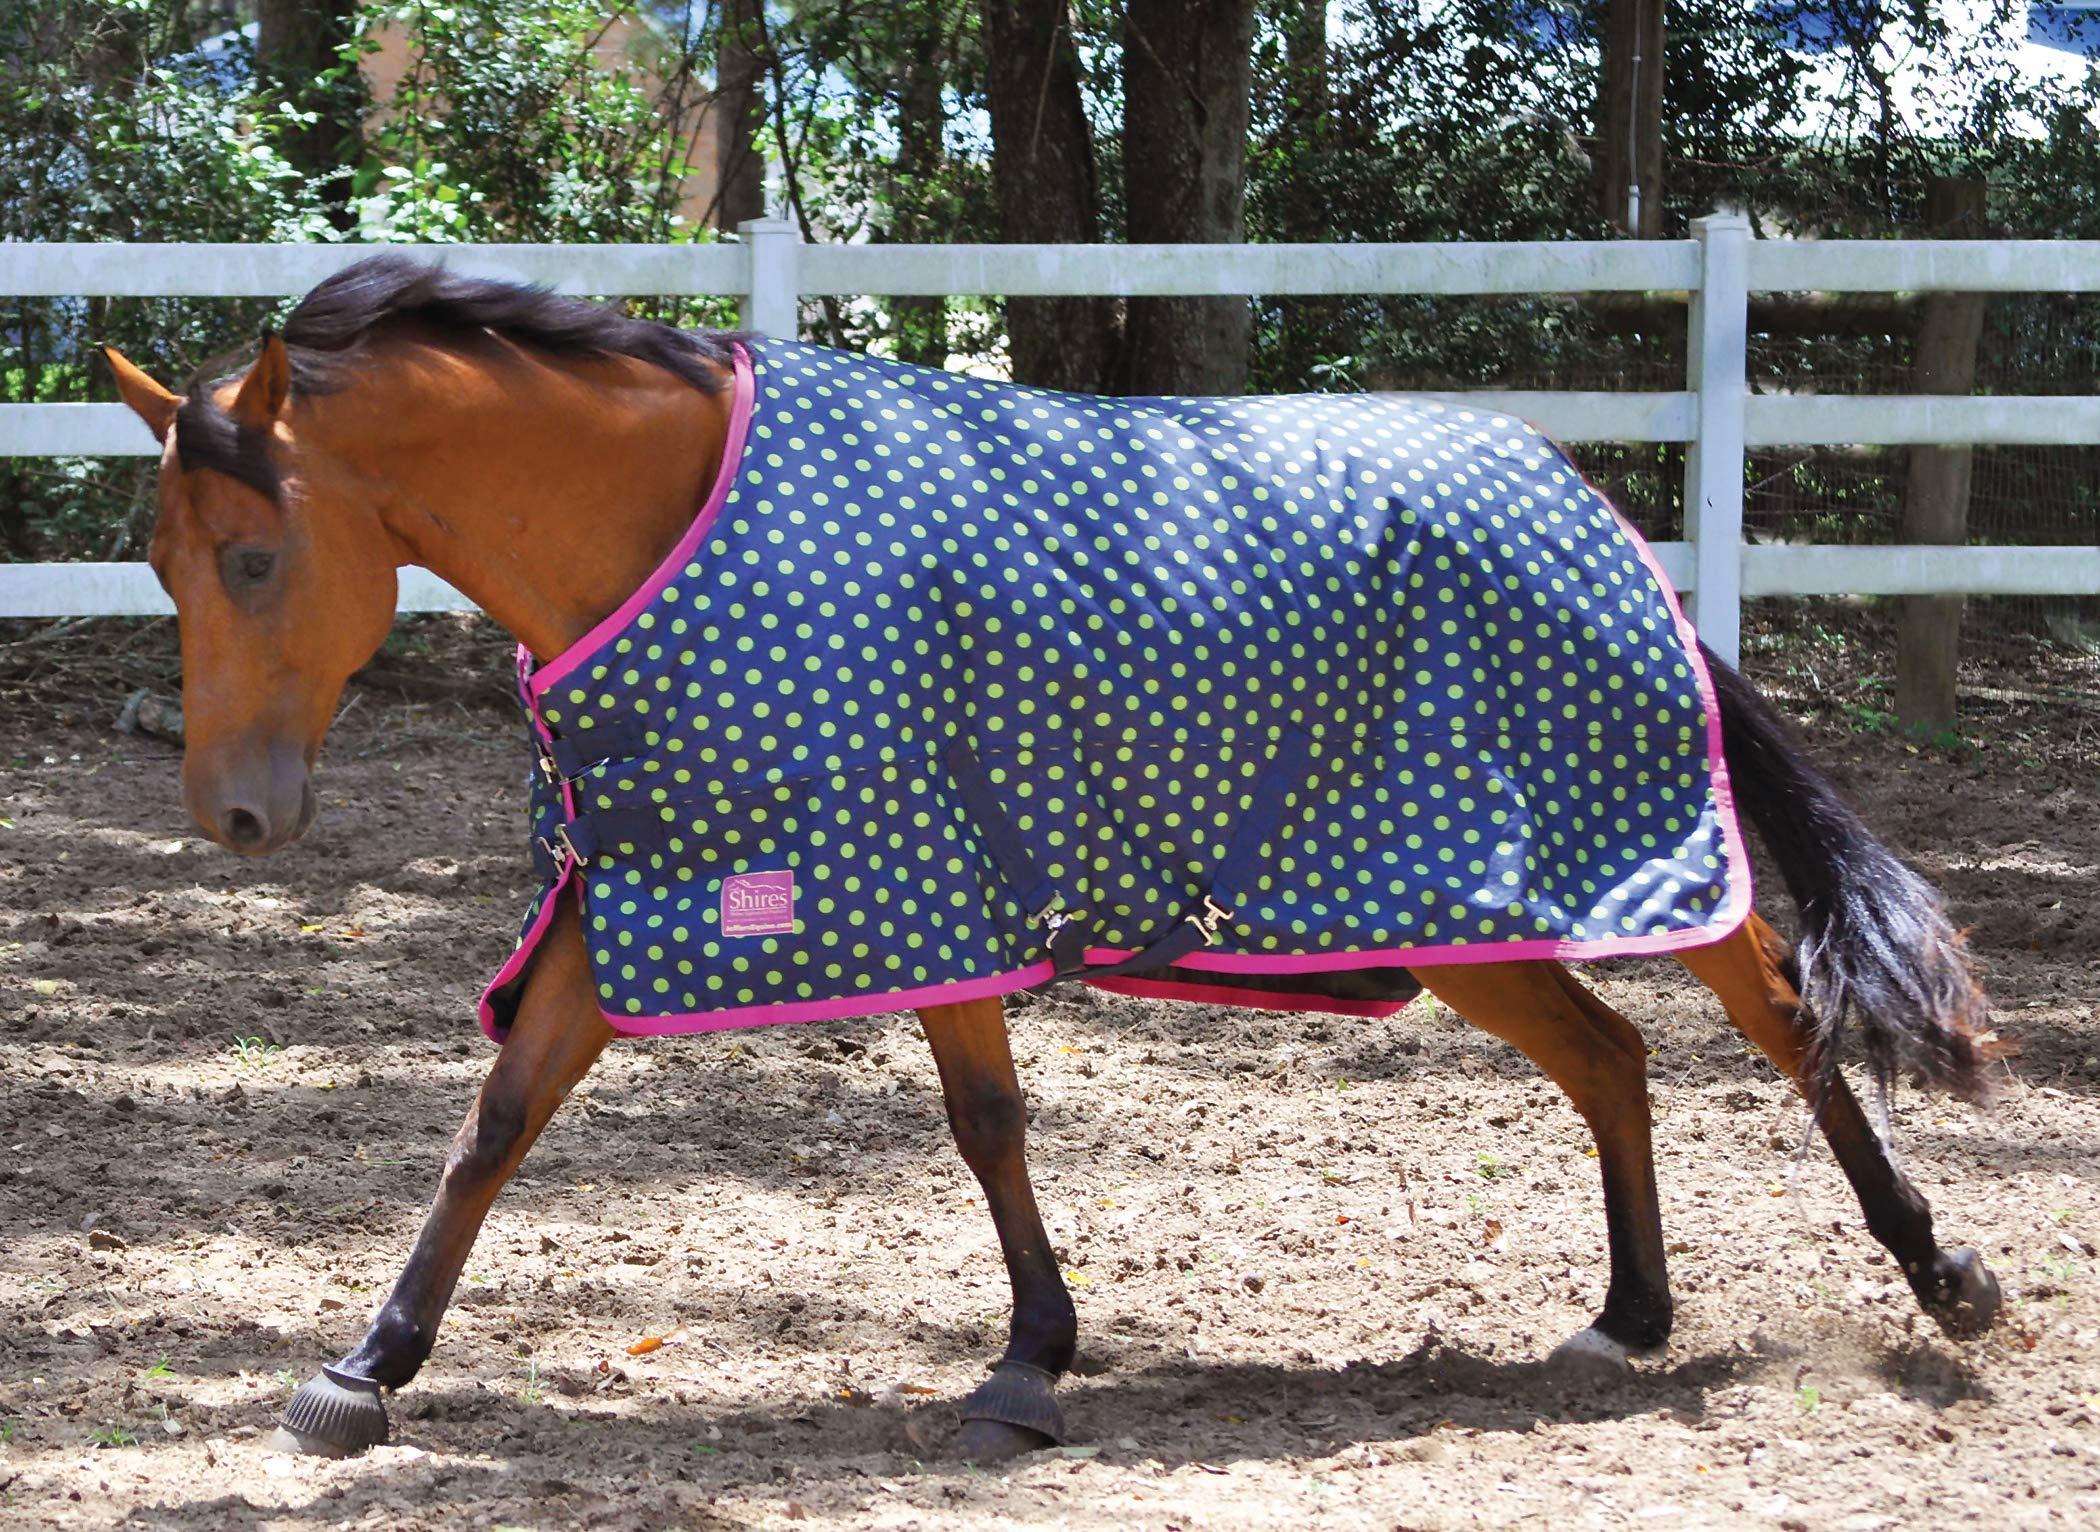 Jeffers Polka Dot Tempest Horse Blanket, Lime Green by Jeffers